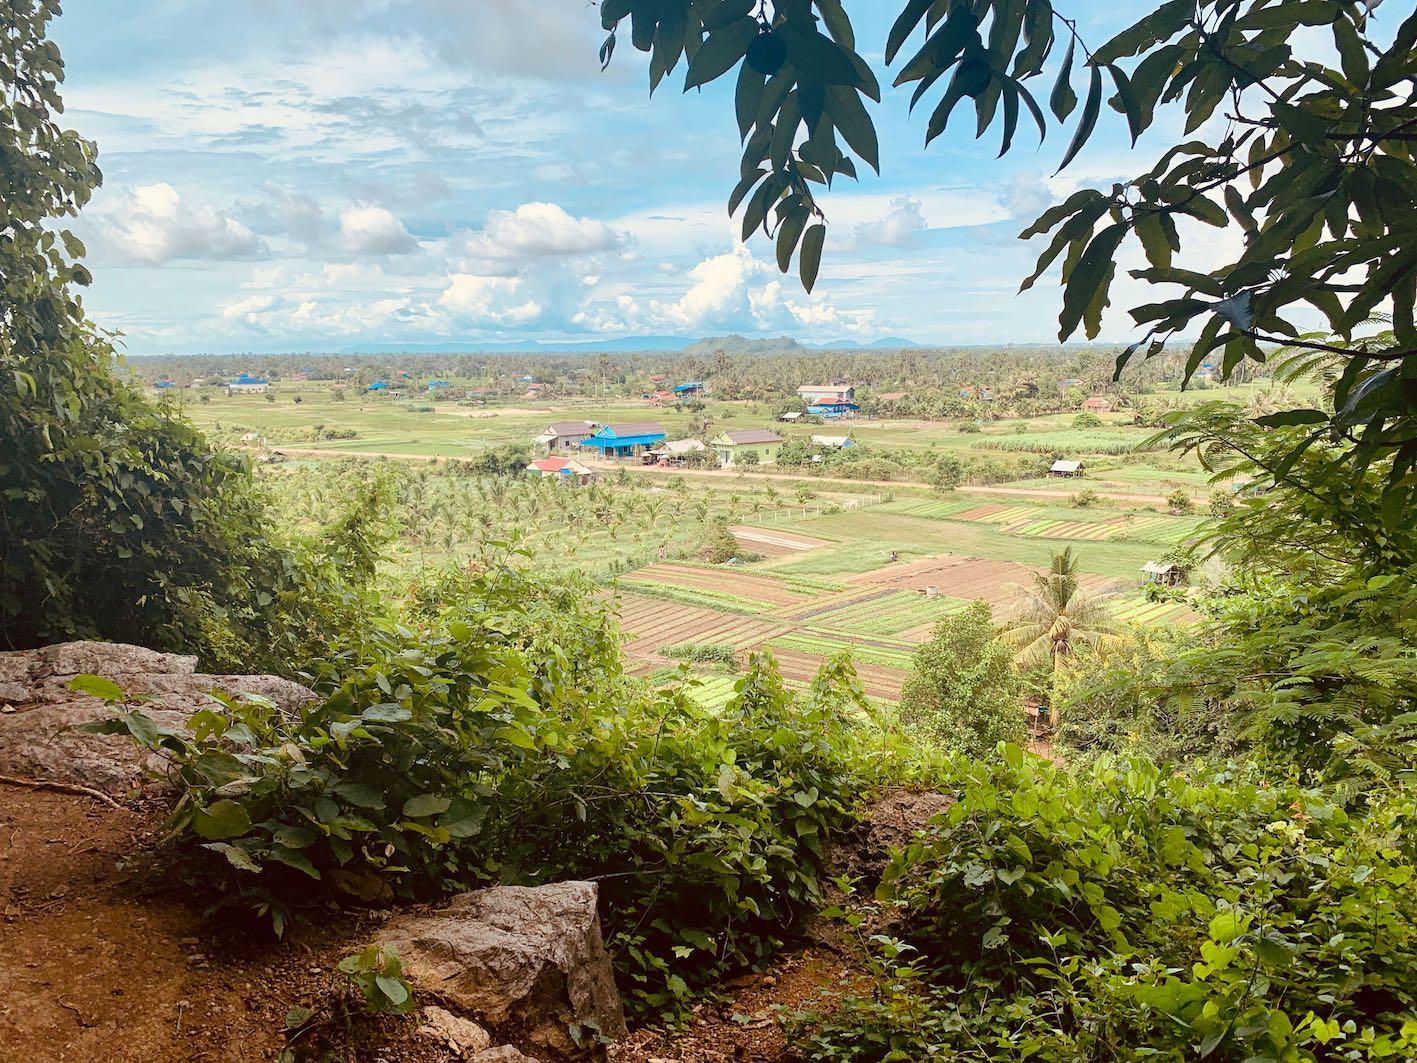 Views over Kampot Province from Phnom Chhngok